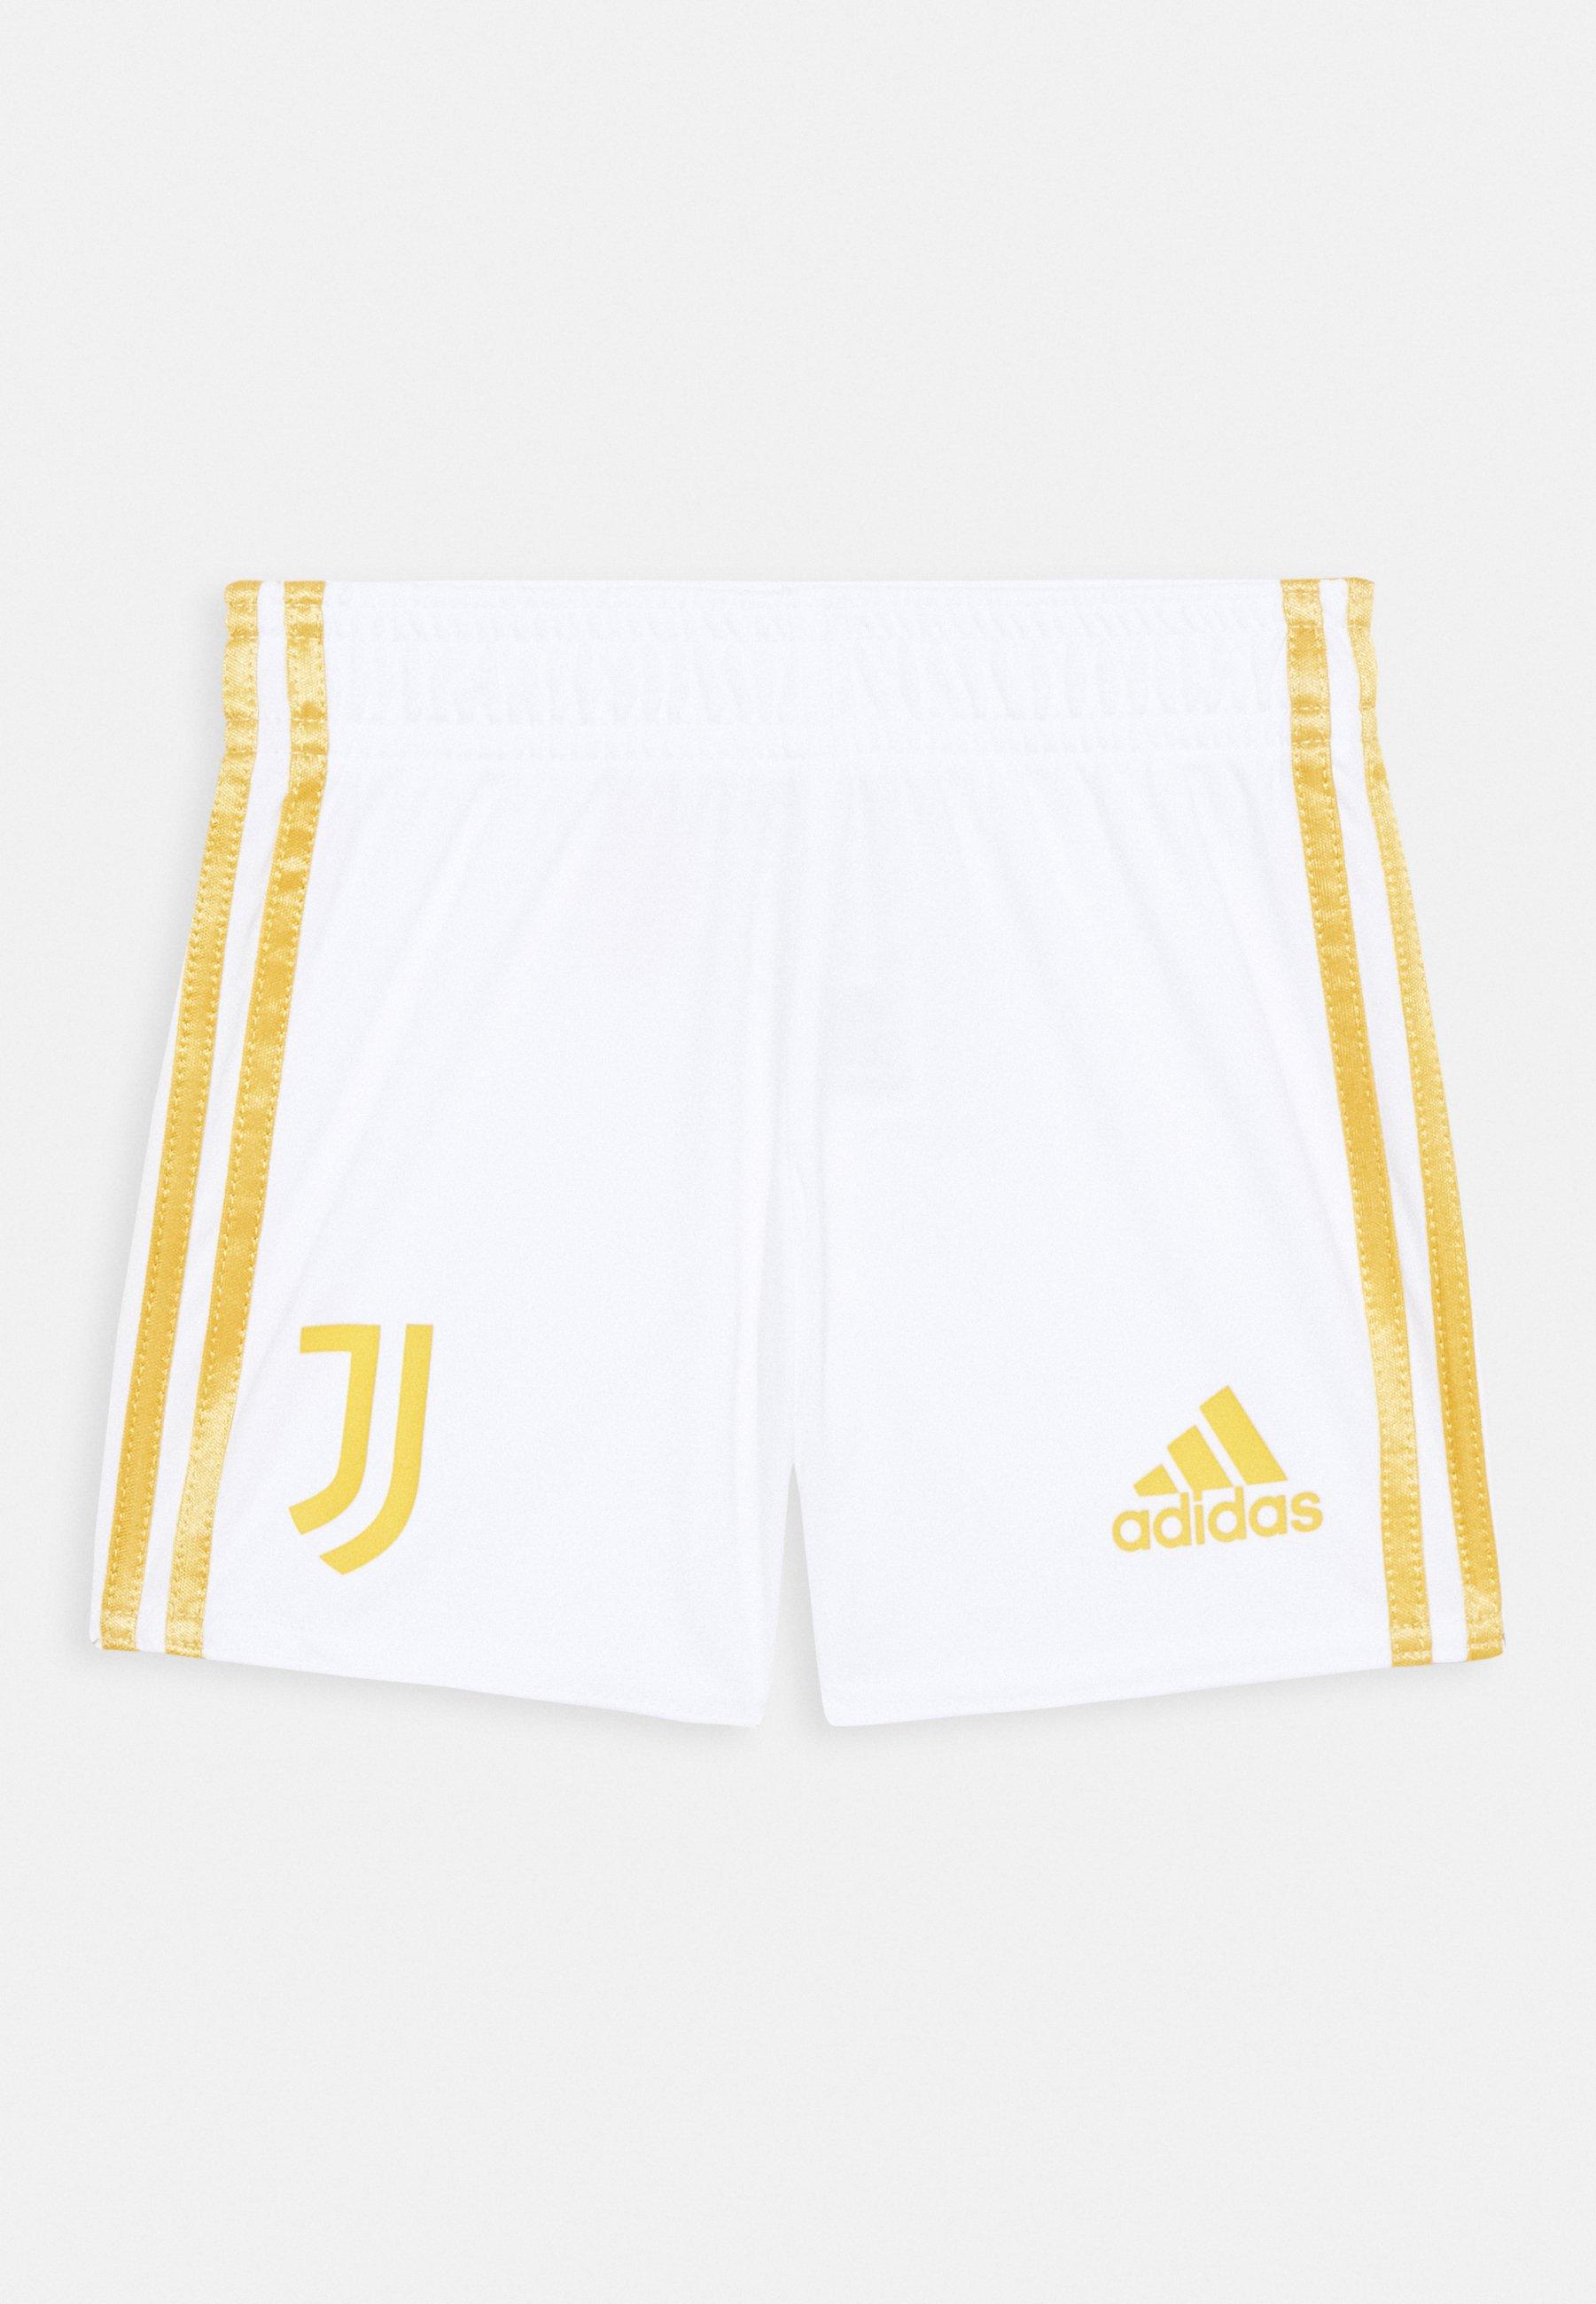 adidas Originals SET Sweatjacke blackgrefivwhite